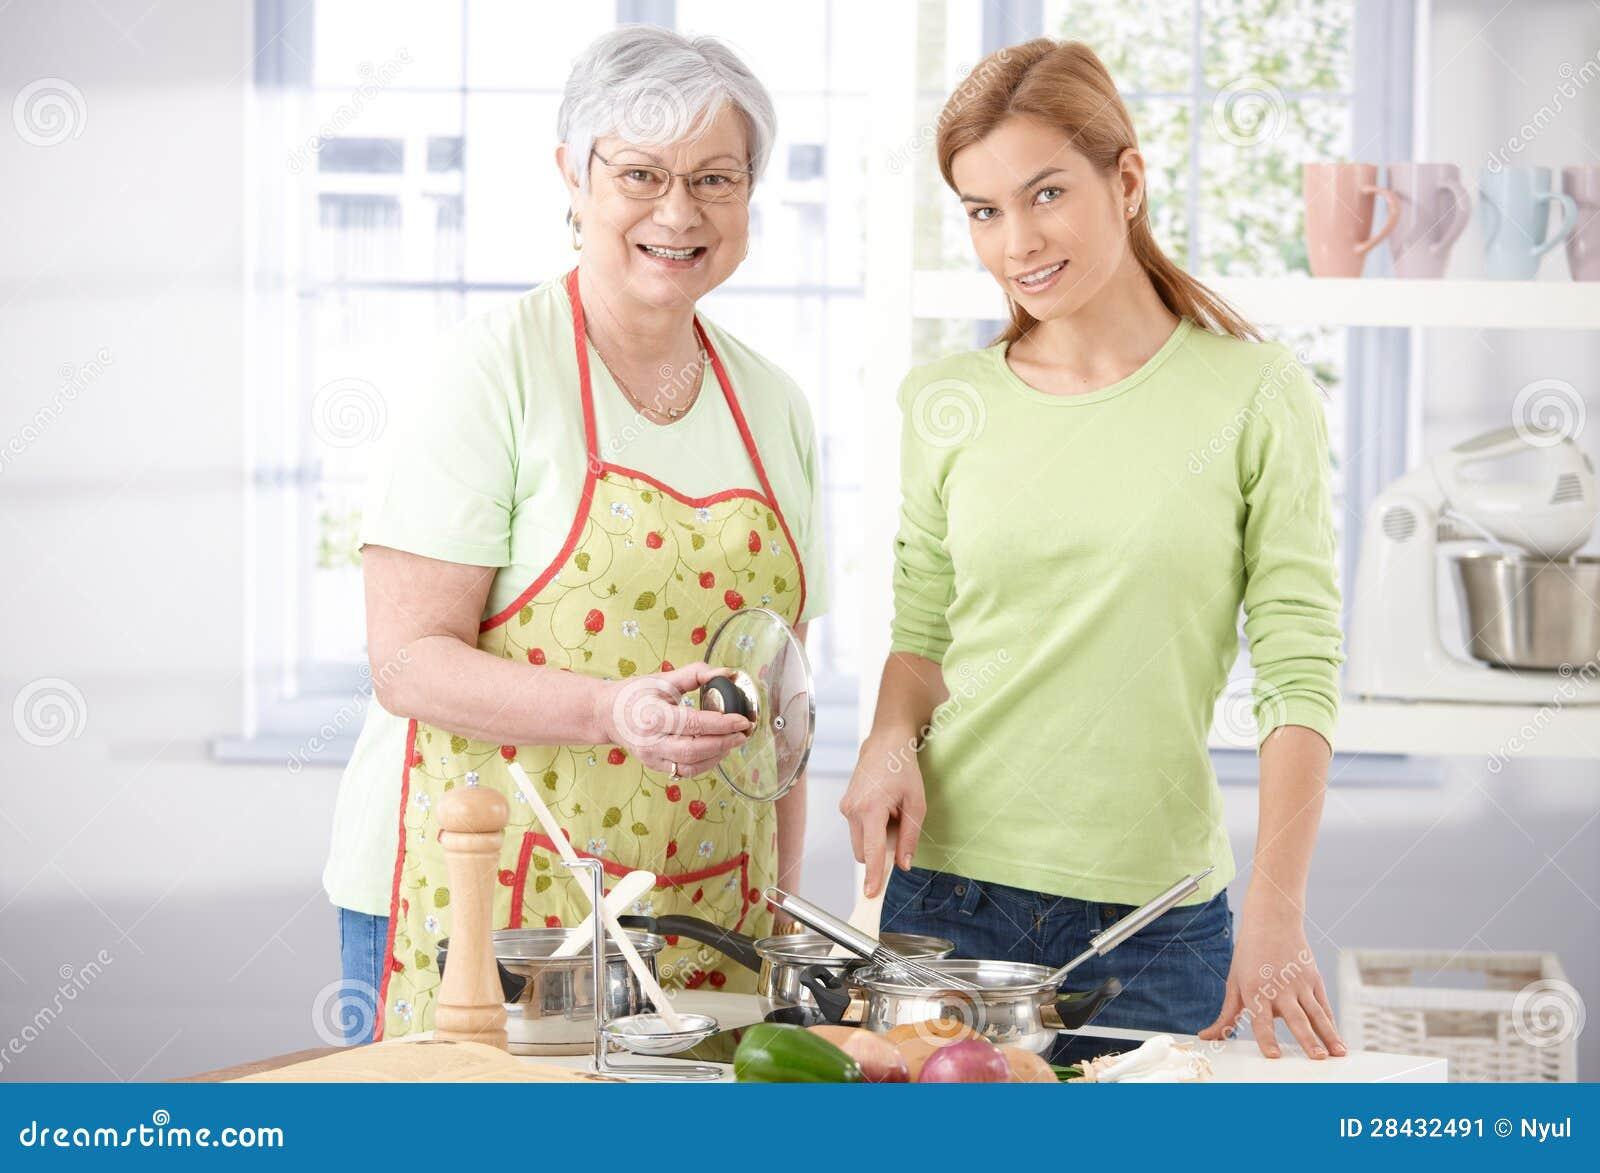 Теща на кухне 16 фотография